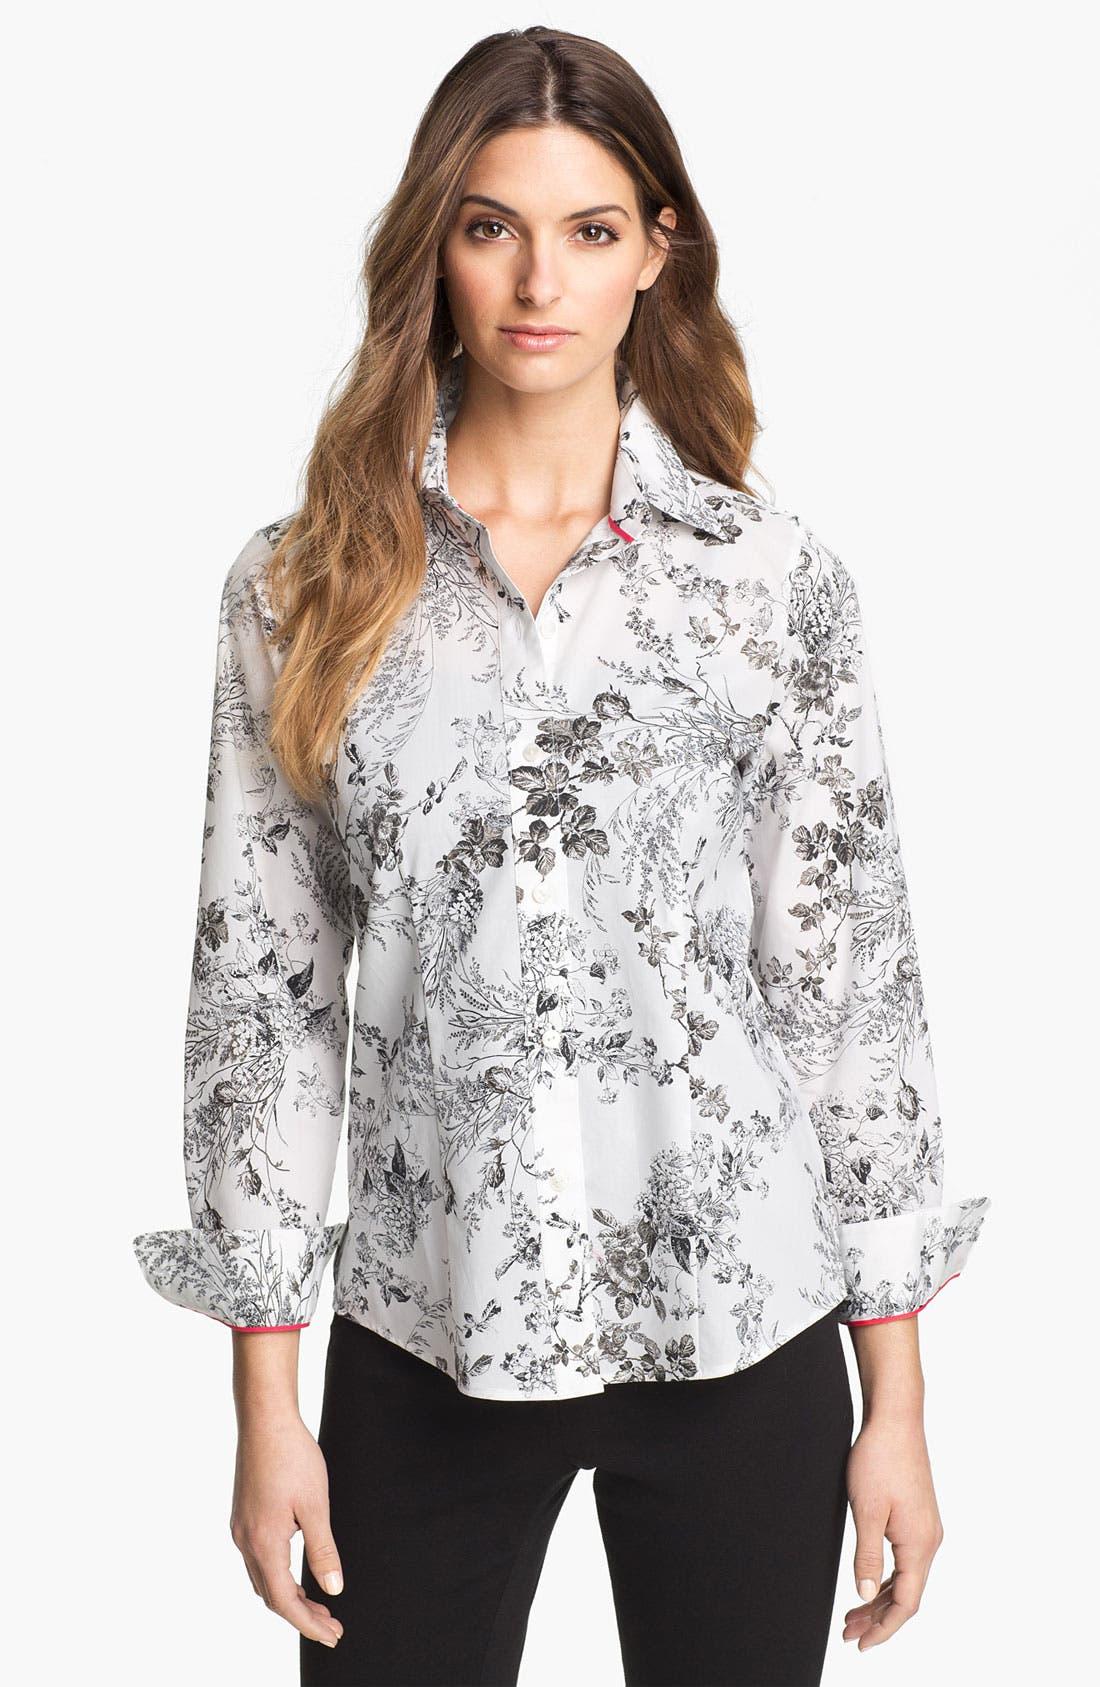 Alternate Image 1 Selected - Foxcroft 'Wild Rose' Print Shirt (Petite)